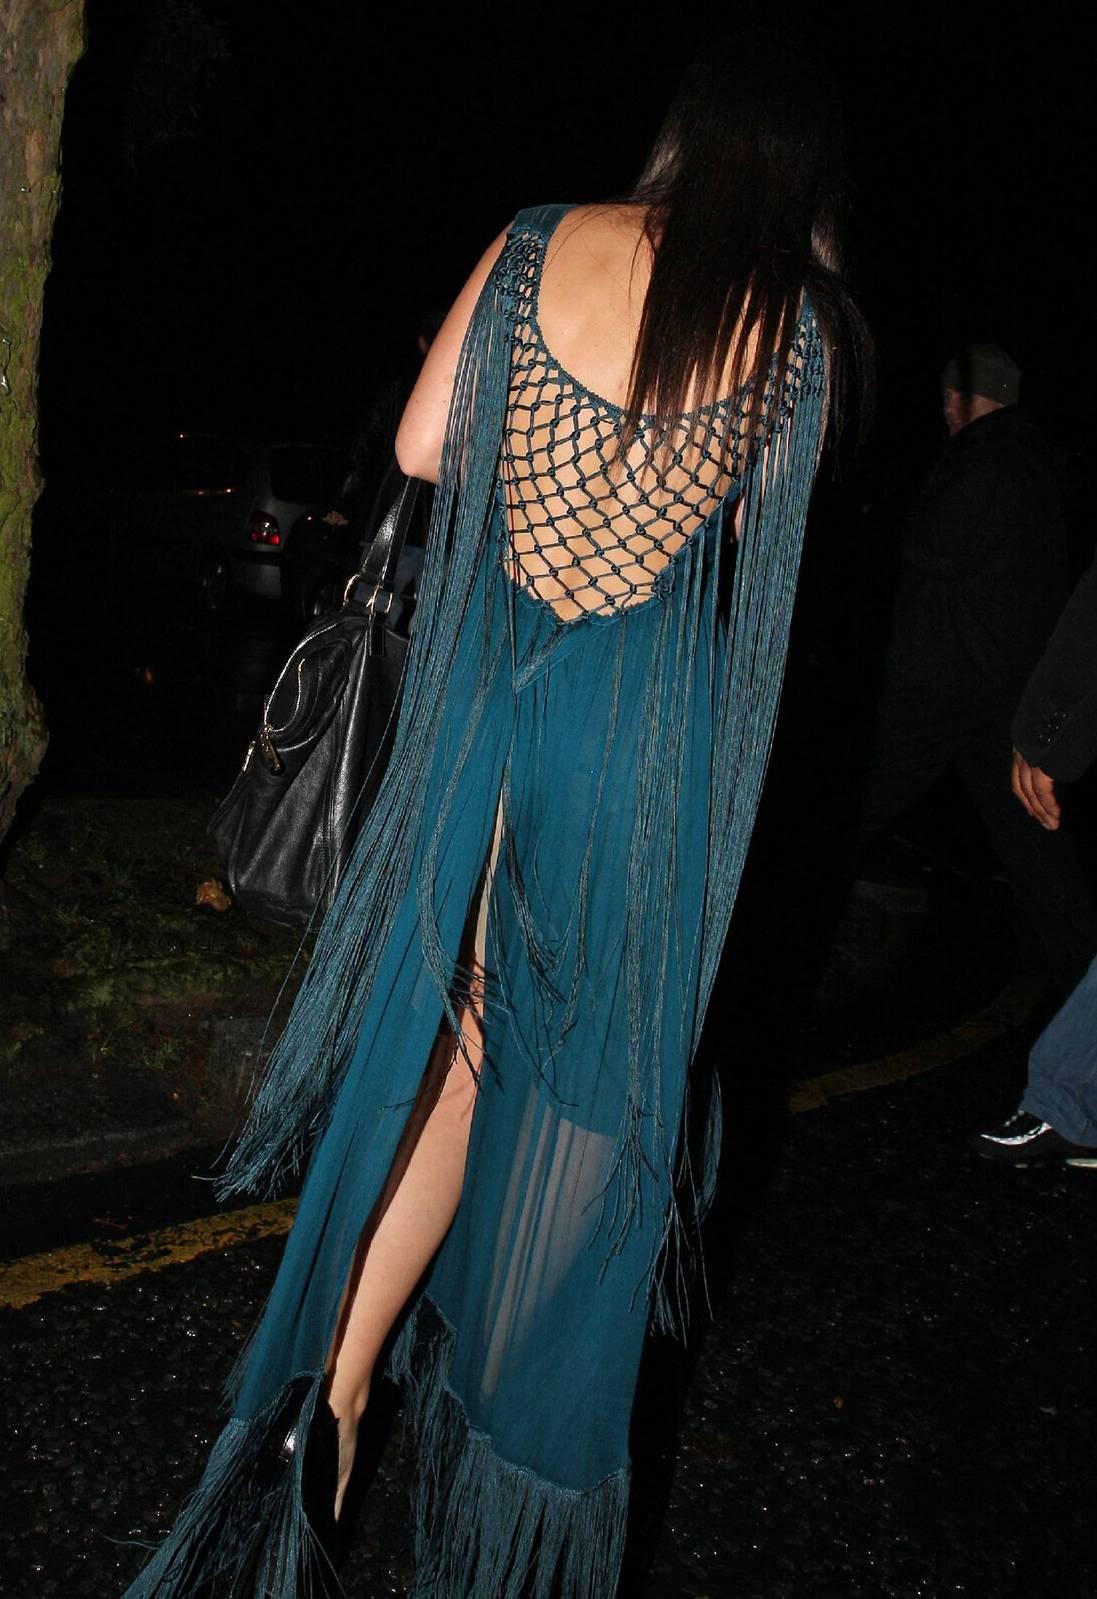 http://3.bp.blogspot.com/_3lrR1DXZVrw/TEXUspyNEnI/AAAAAAAAEG4/psEeKR5amvA/s1600/lily-allen-fringed-dress.jpg